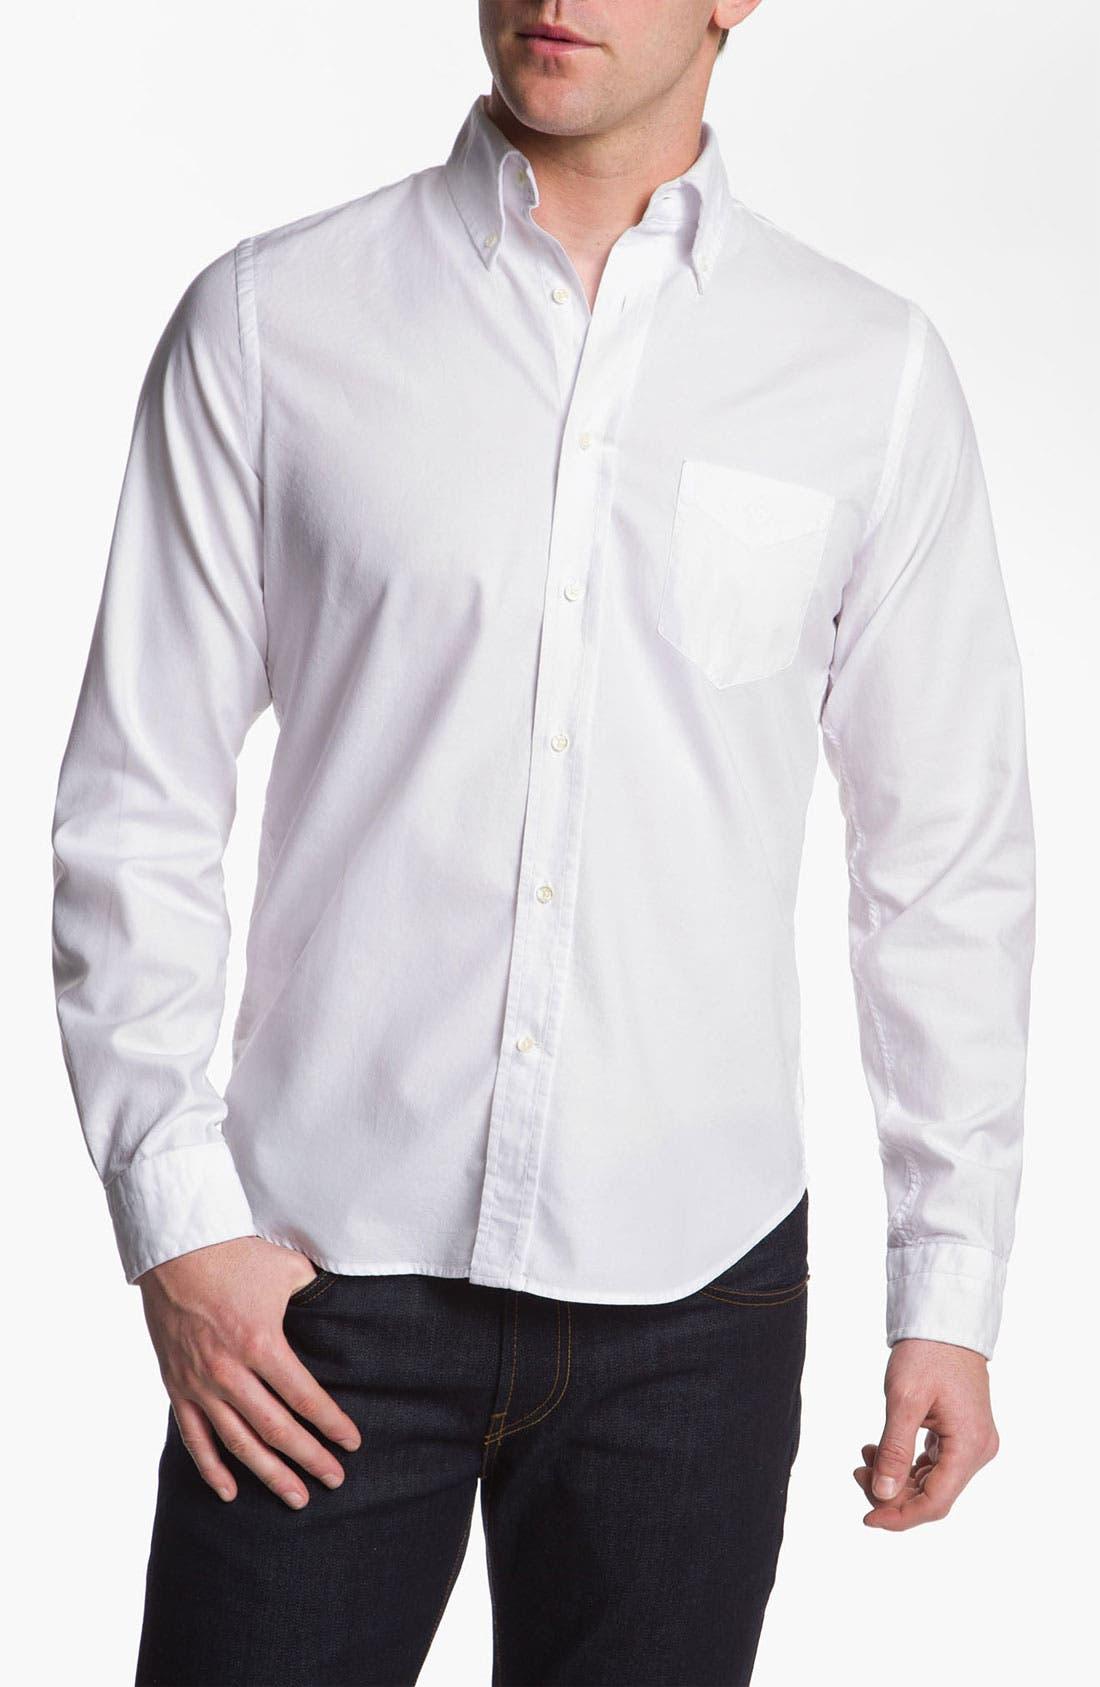 Main Image - Gant Rugger Oxford Shirt